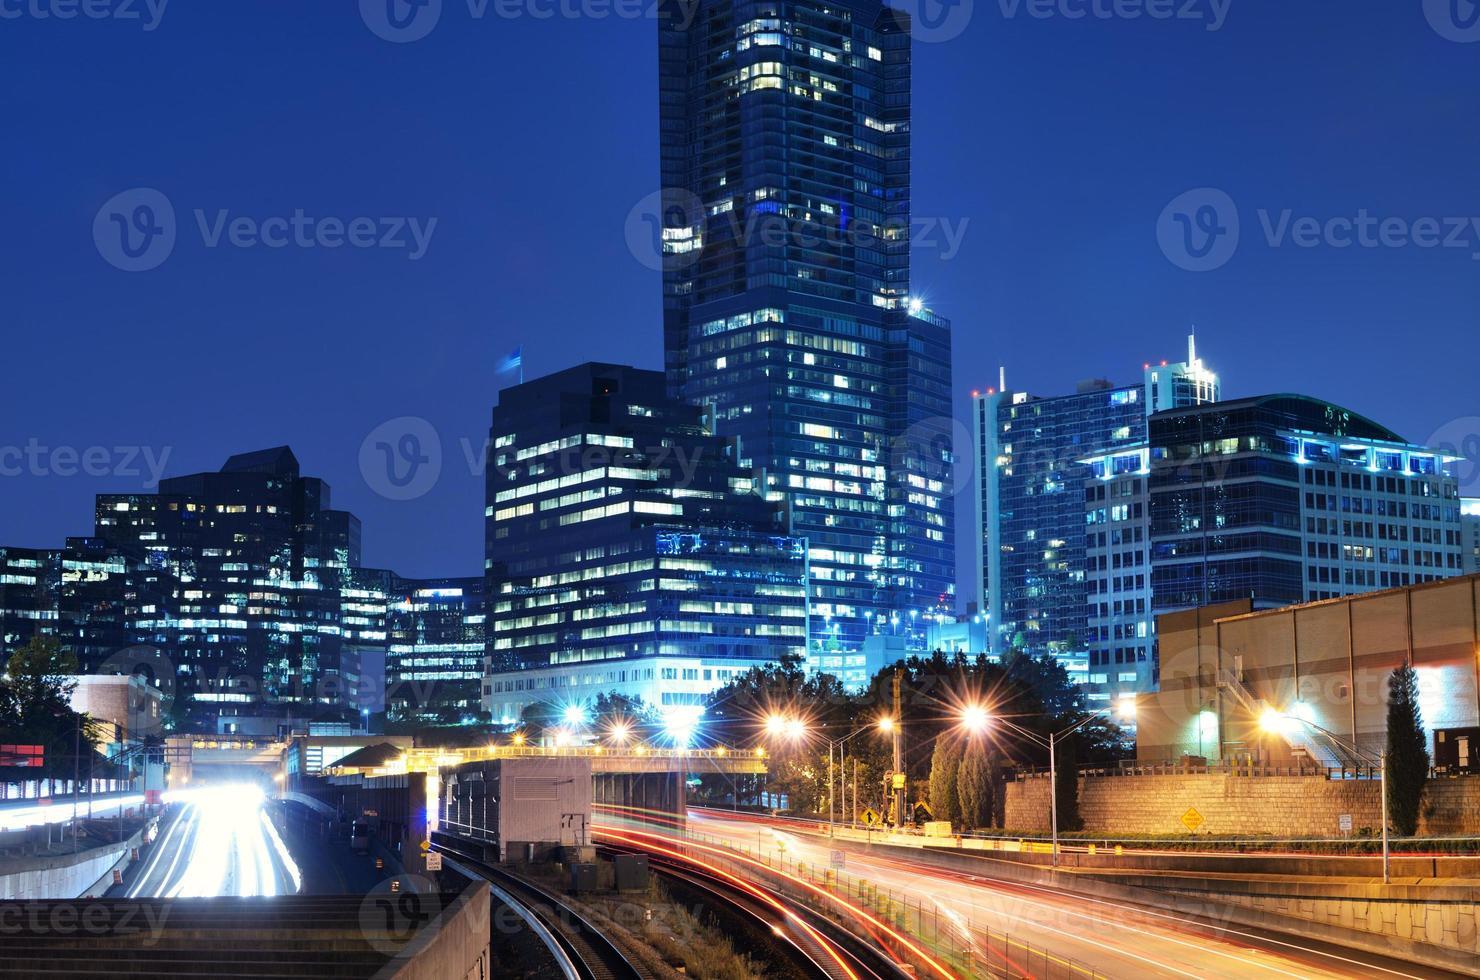 autoroute illuminée à buckhead photo